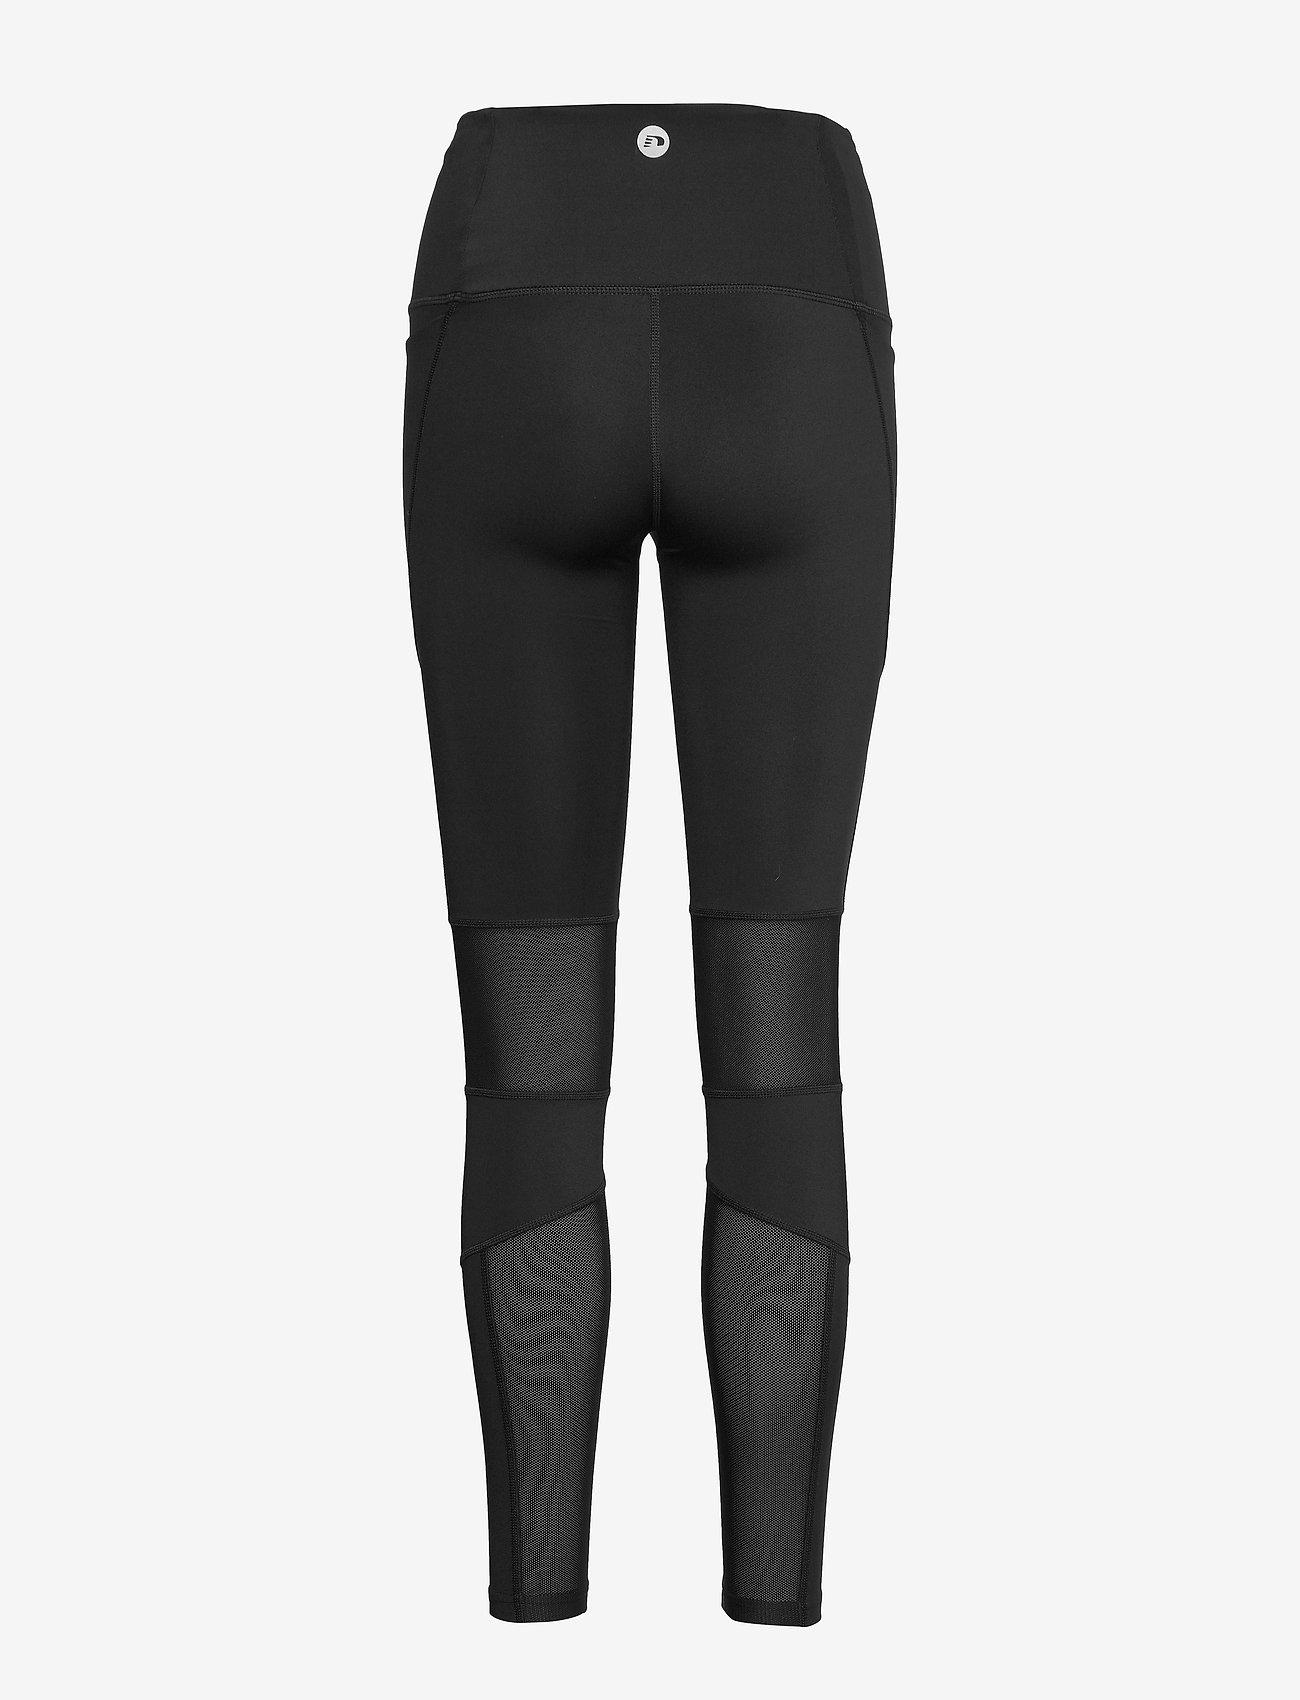 Newline Women's Tech Tights - Leggings & Black